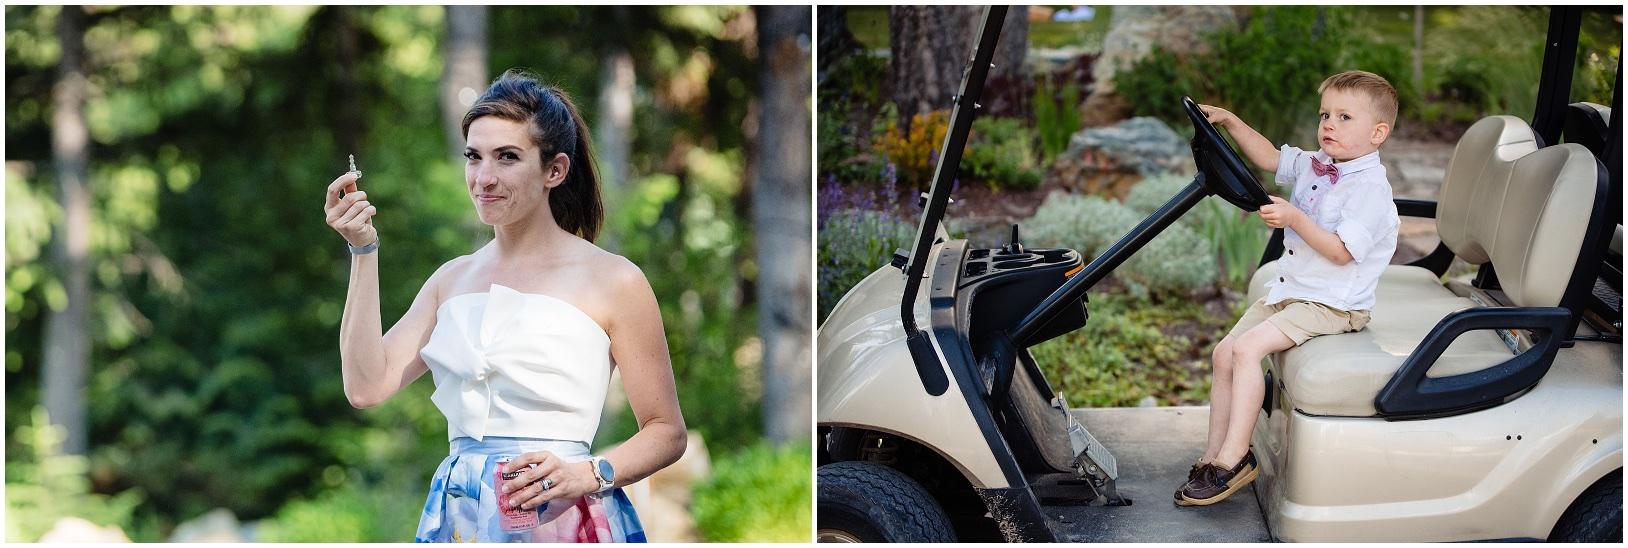 lindseyjanephoto_wedding0123.jpg